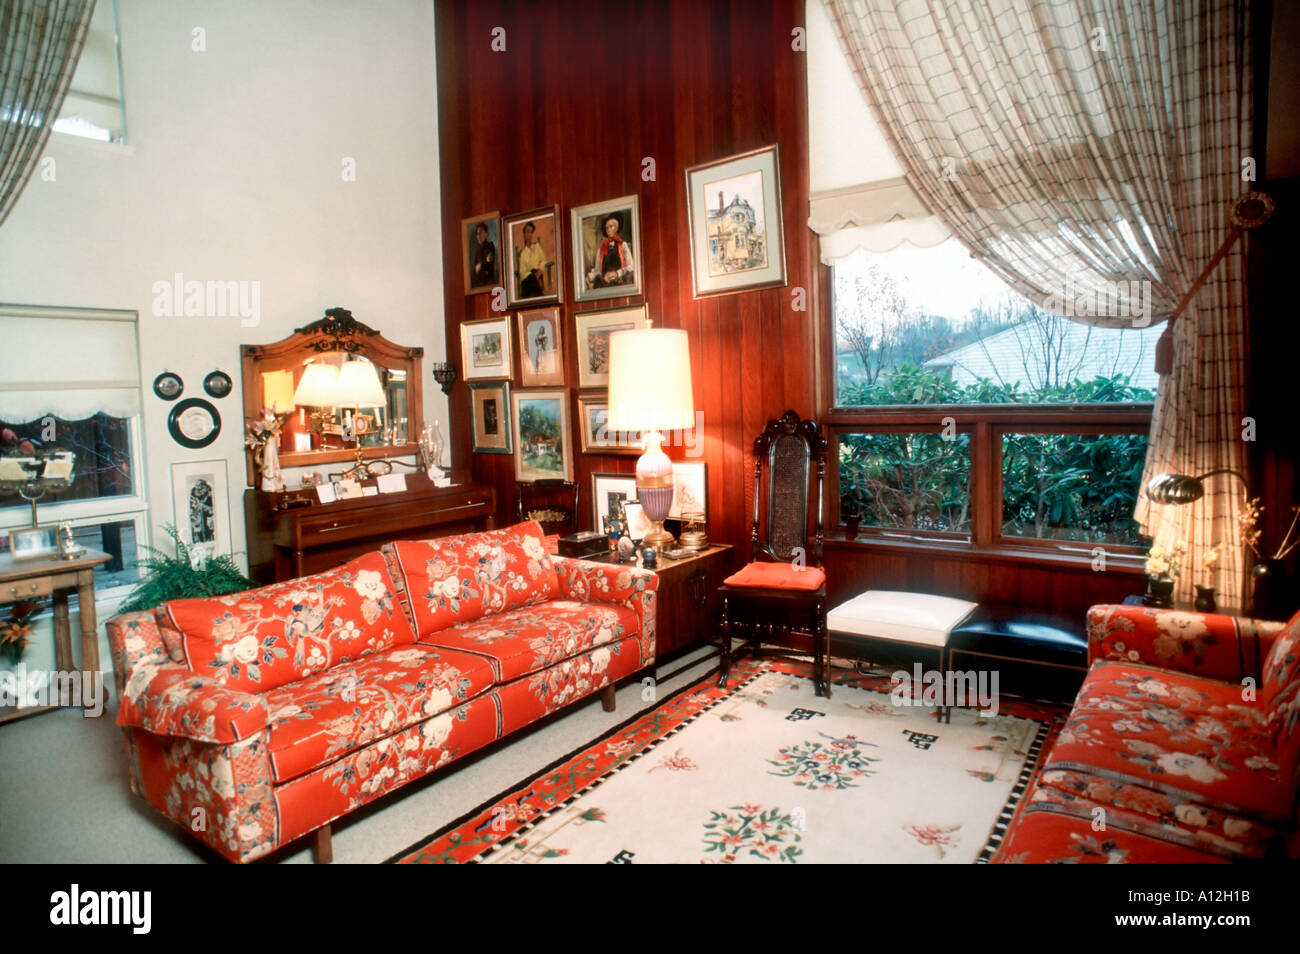 pittsburgh pa usa single family house inside living room interior design - Interior Design Pittsburgh Pa